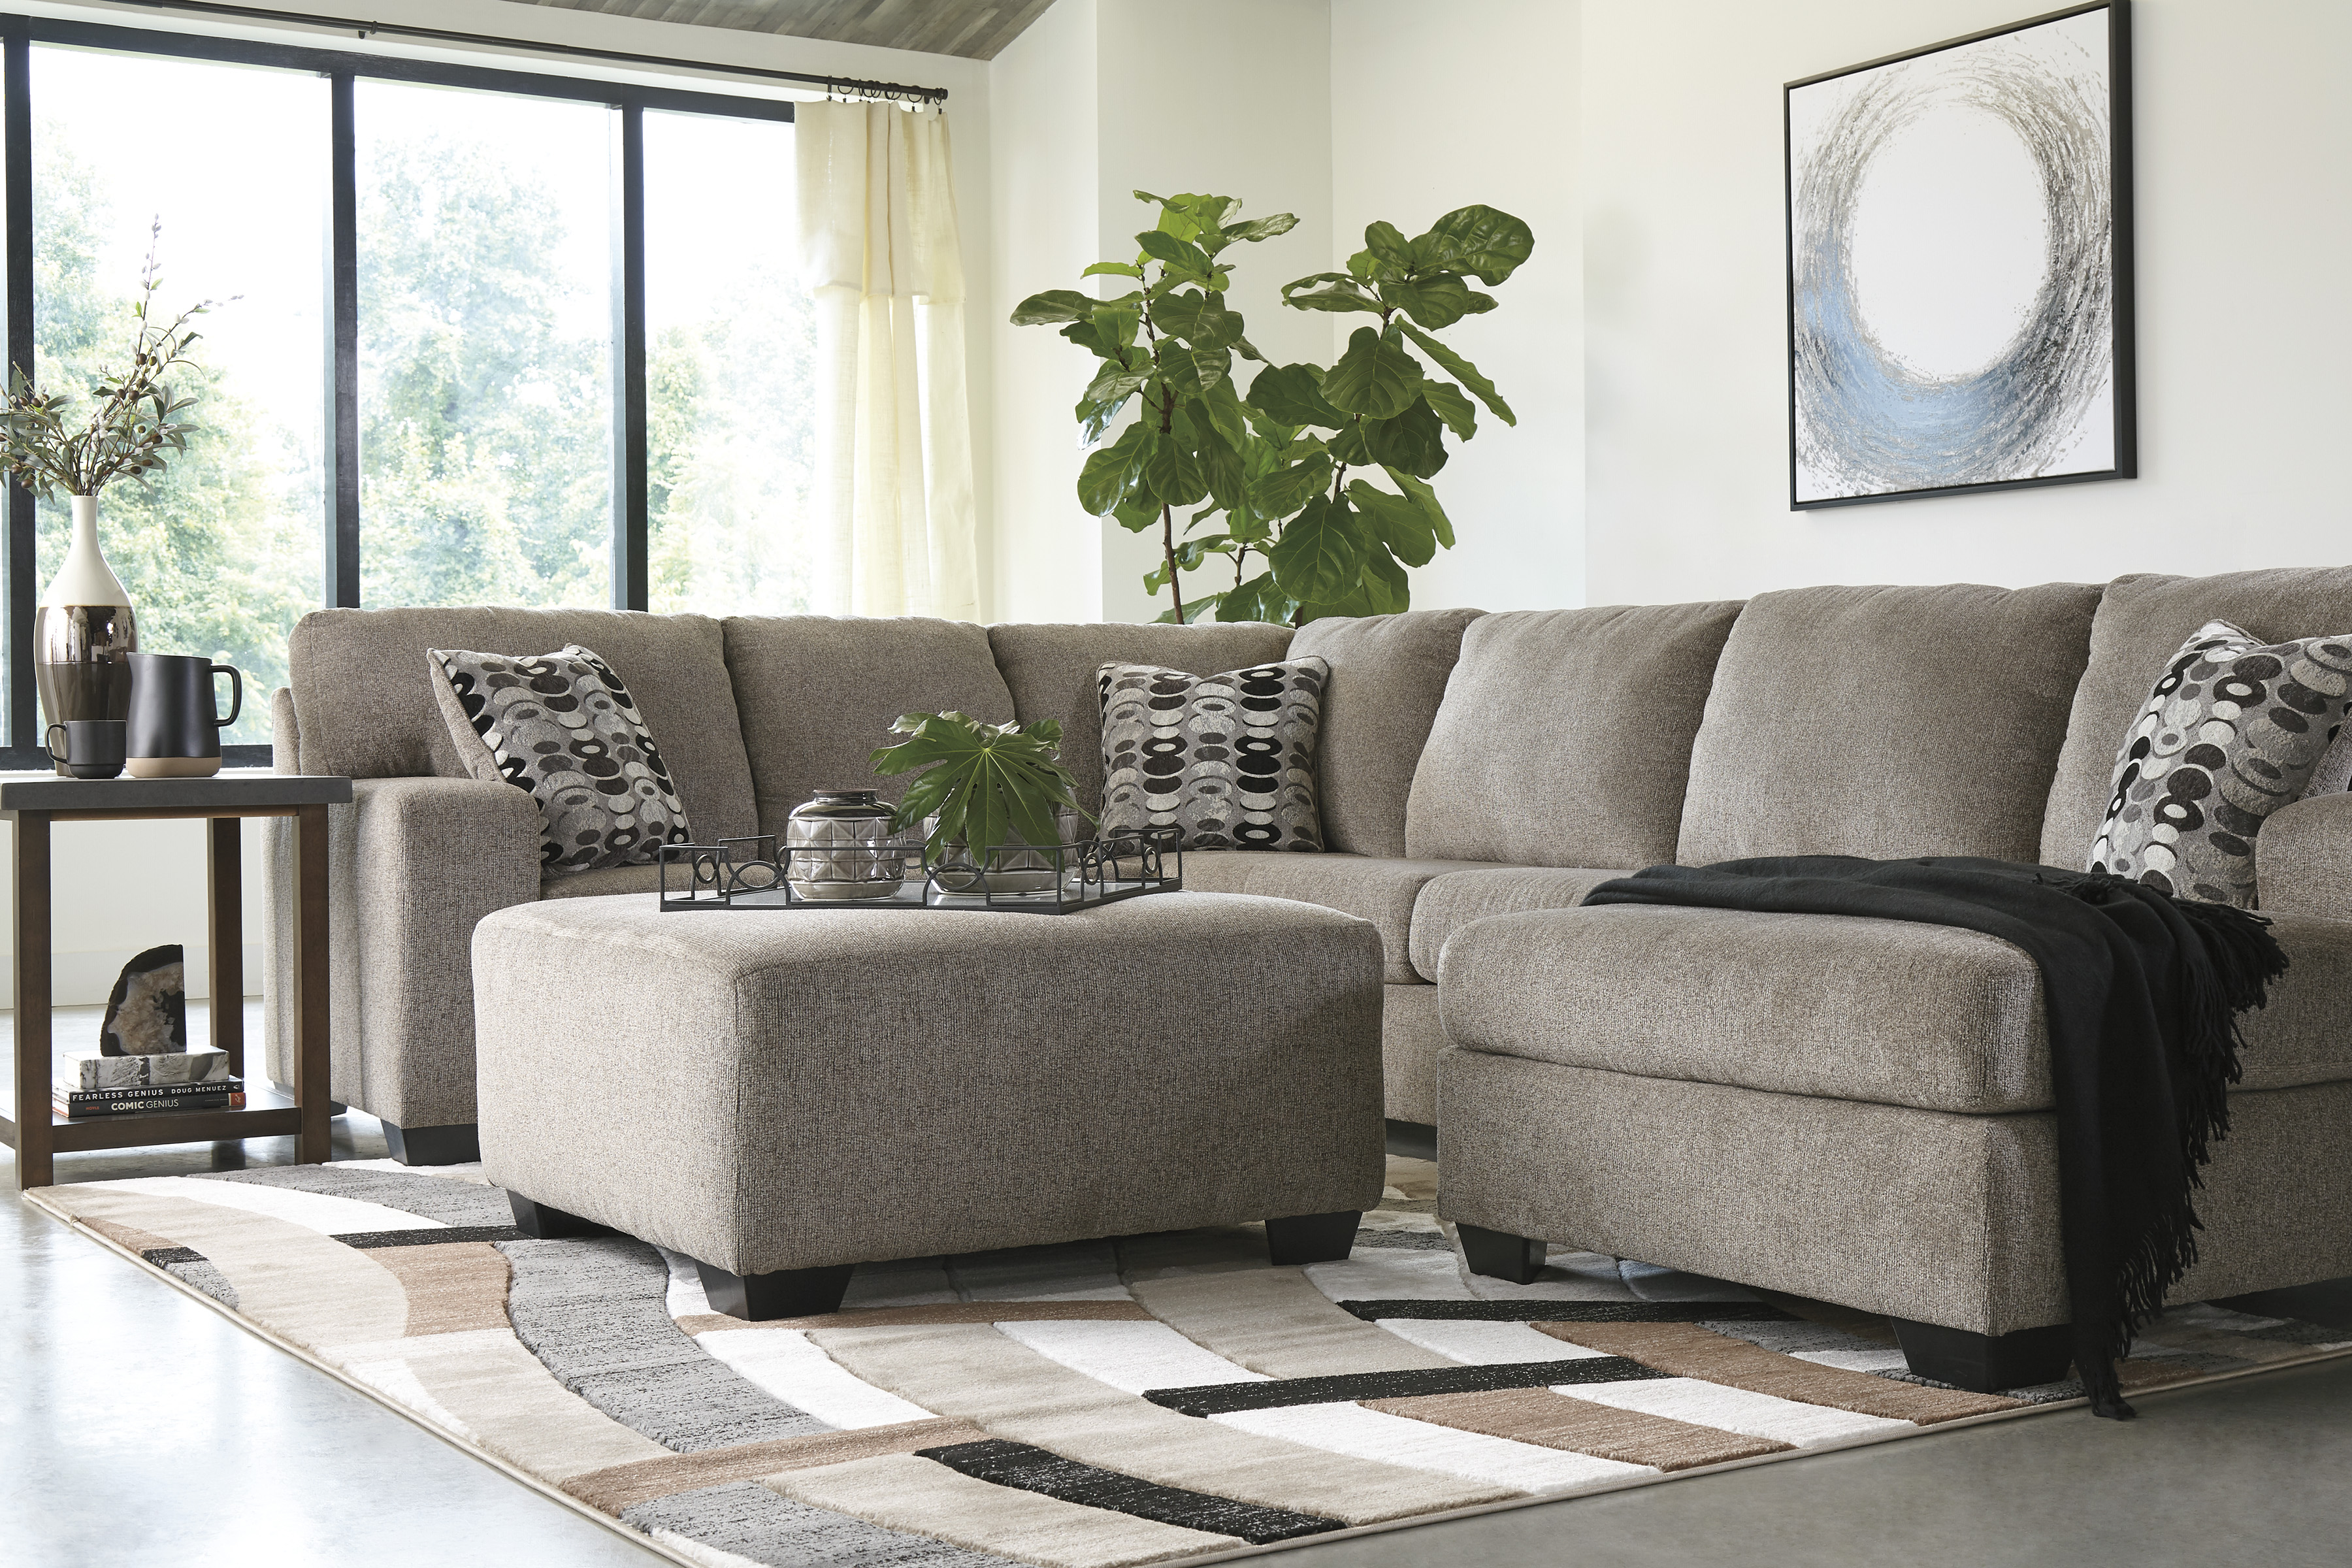 Ballinasloe Platinum Living Room All American Furniture